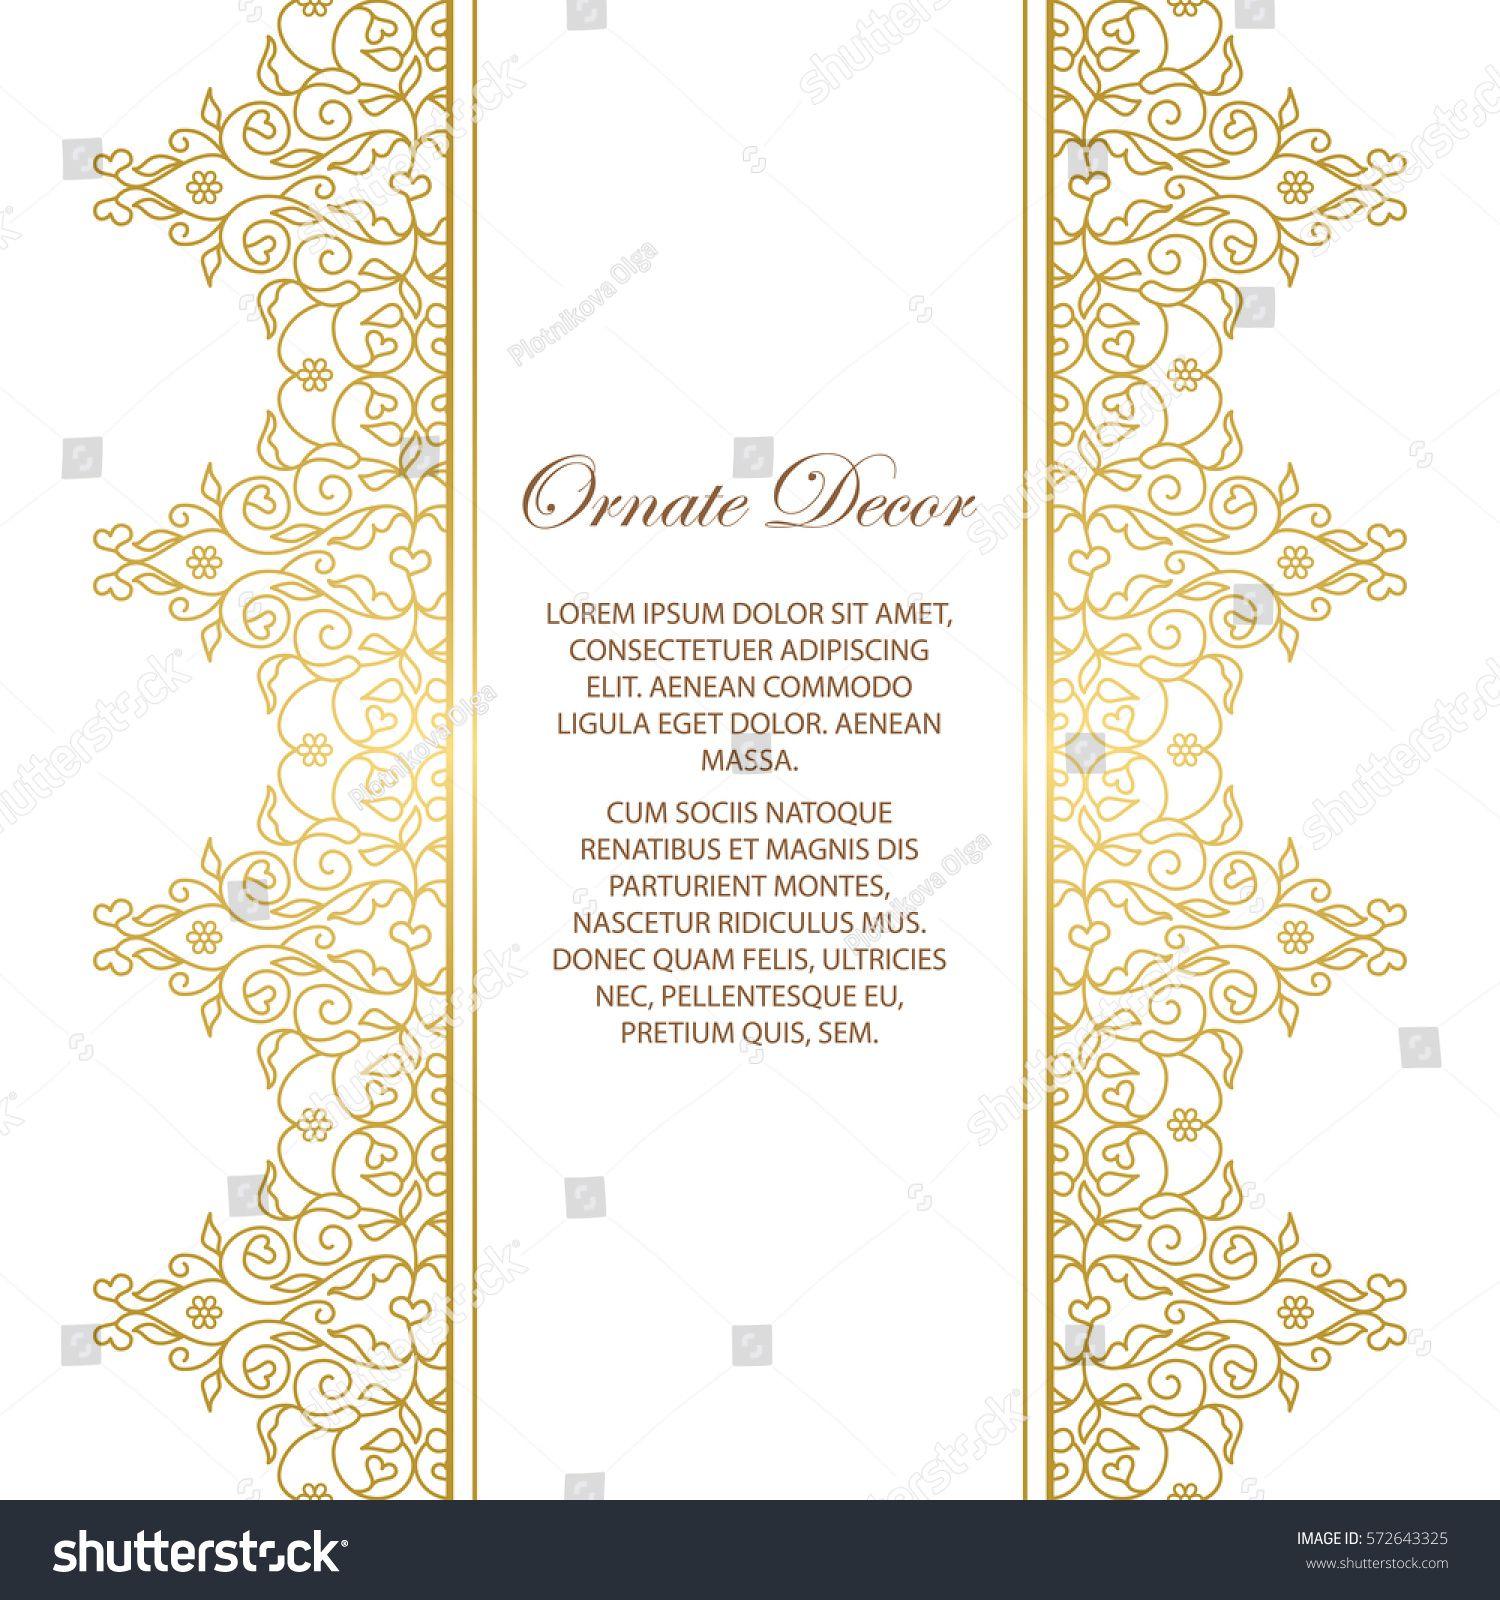 Vector Gold Ornamental Decorative Frame Elegant Ornate Element For Design Template Place For Text Luxury Floral Border Lace Decor Frame Decor Frame Decor